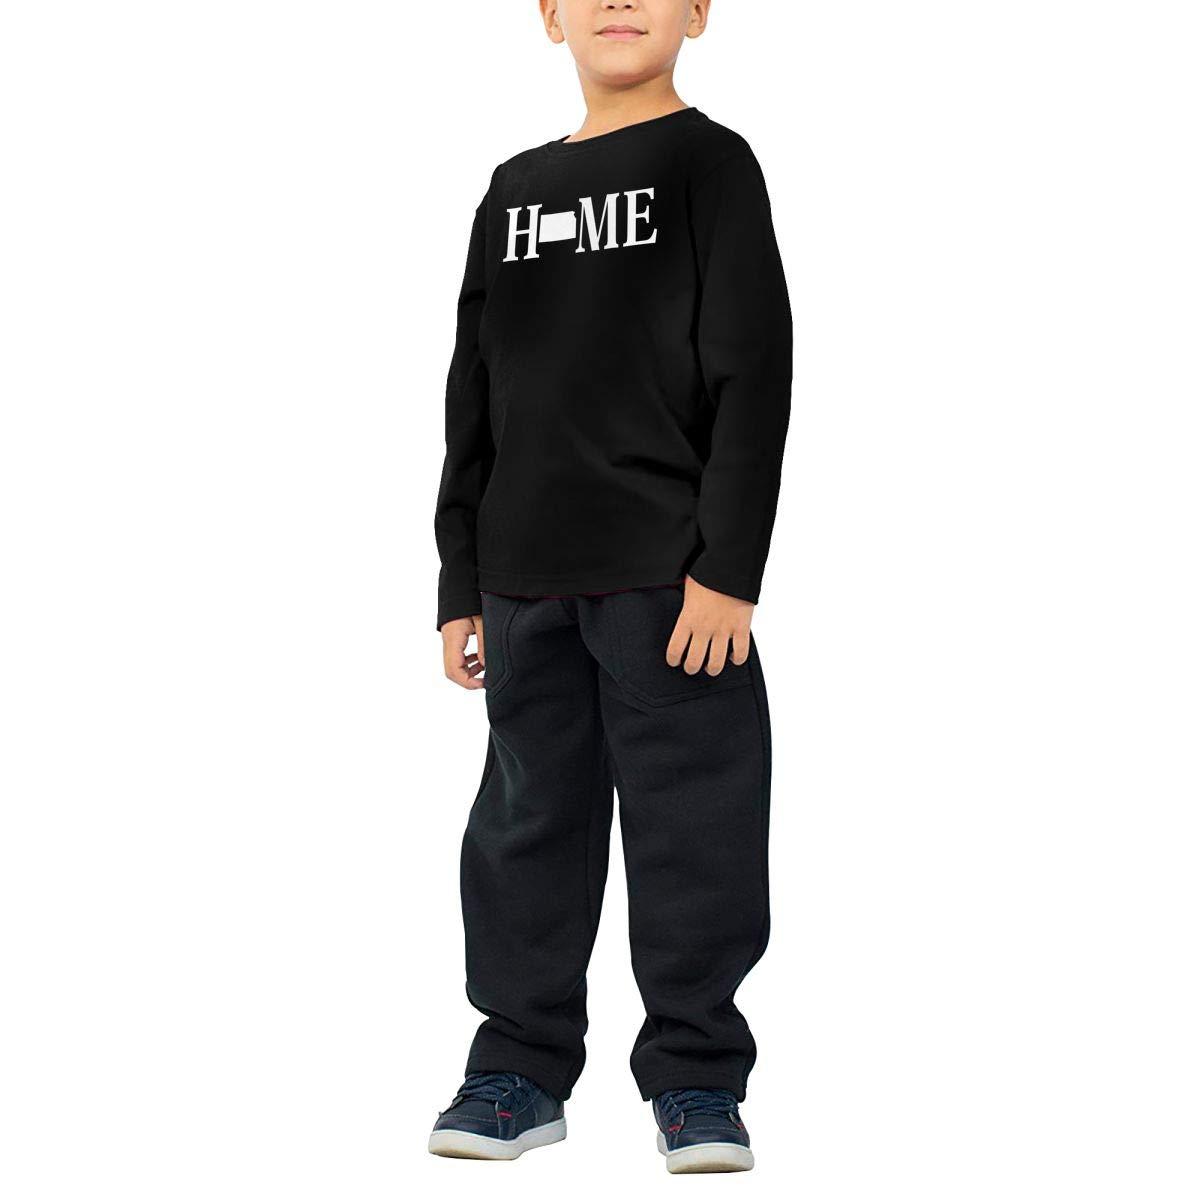 HADYKIDSLOVE Kansas State Home Kids T-Shirt Long Sleeve Boys Girls T-Shirt